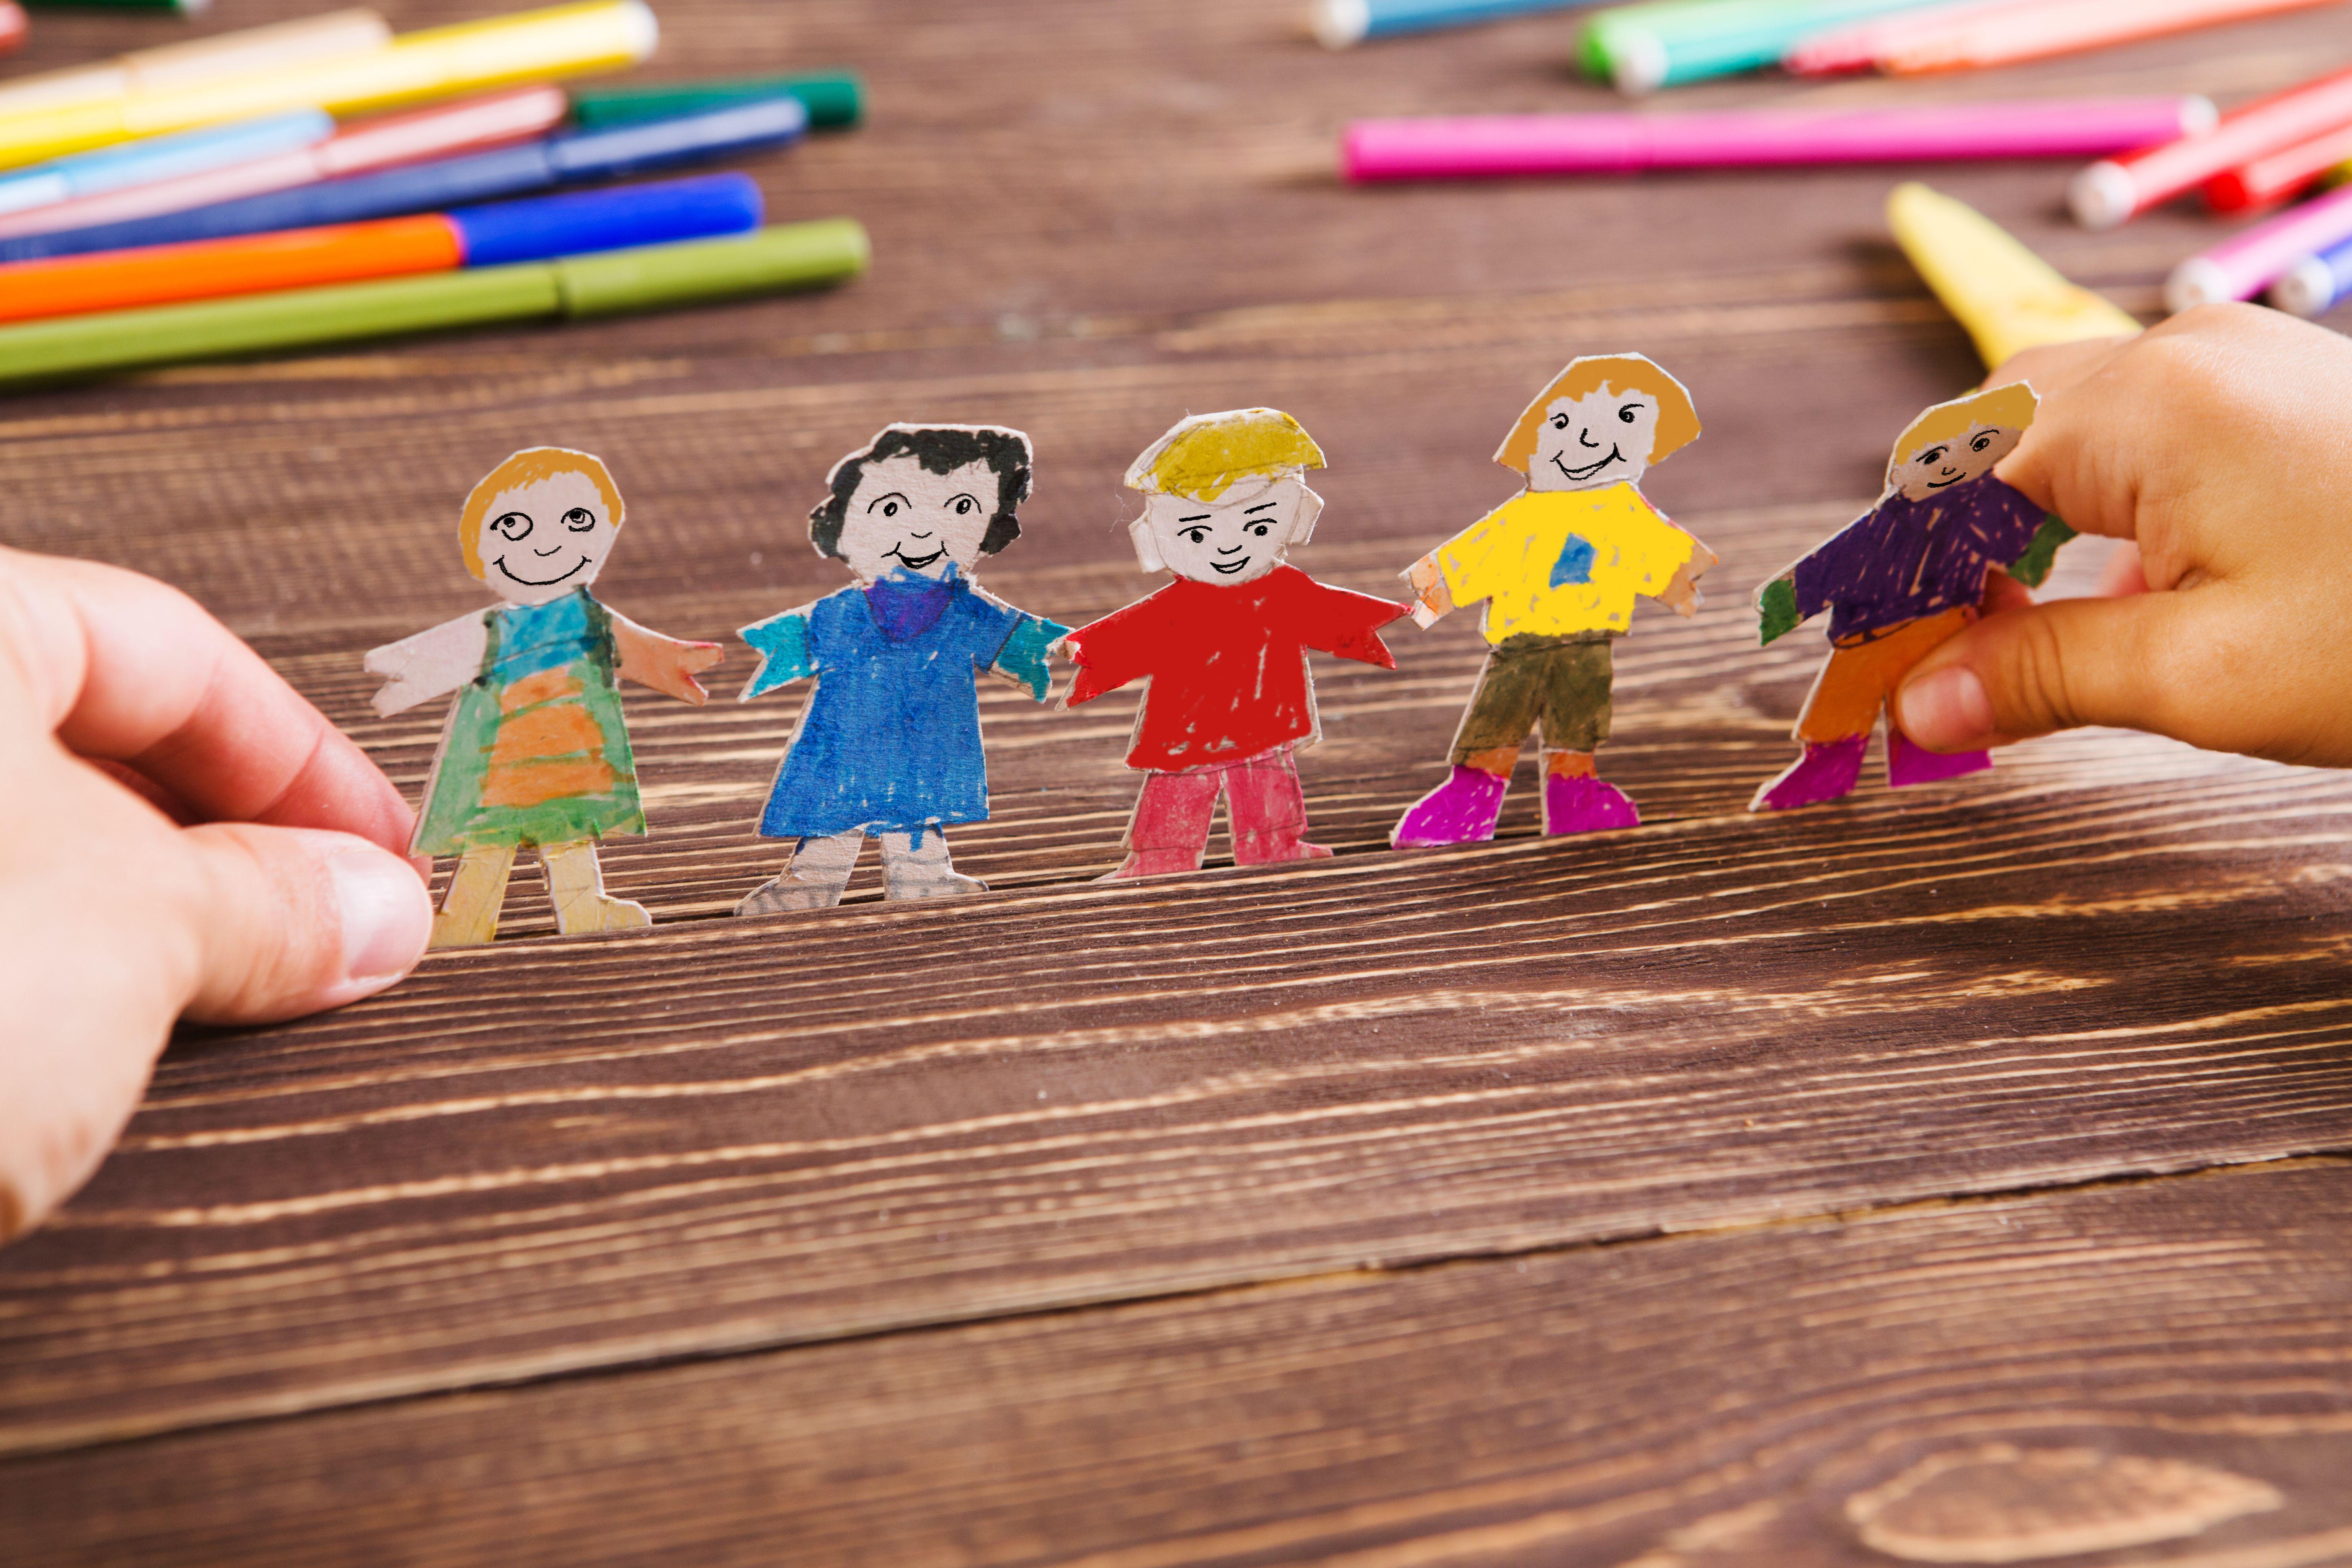 Kurier Jobinitiative Chancen 2020 - Unternehmen unterstützen Familien